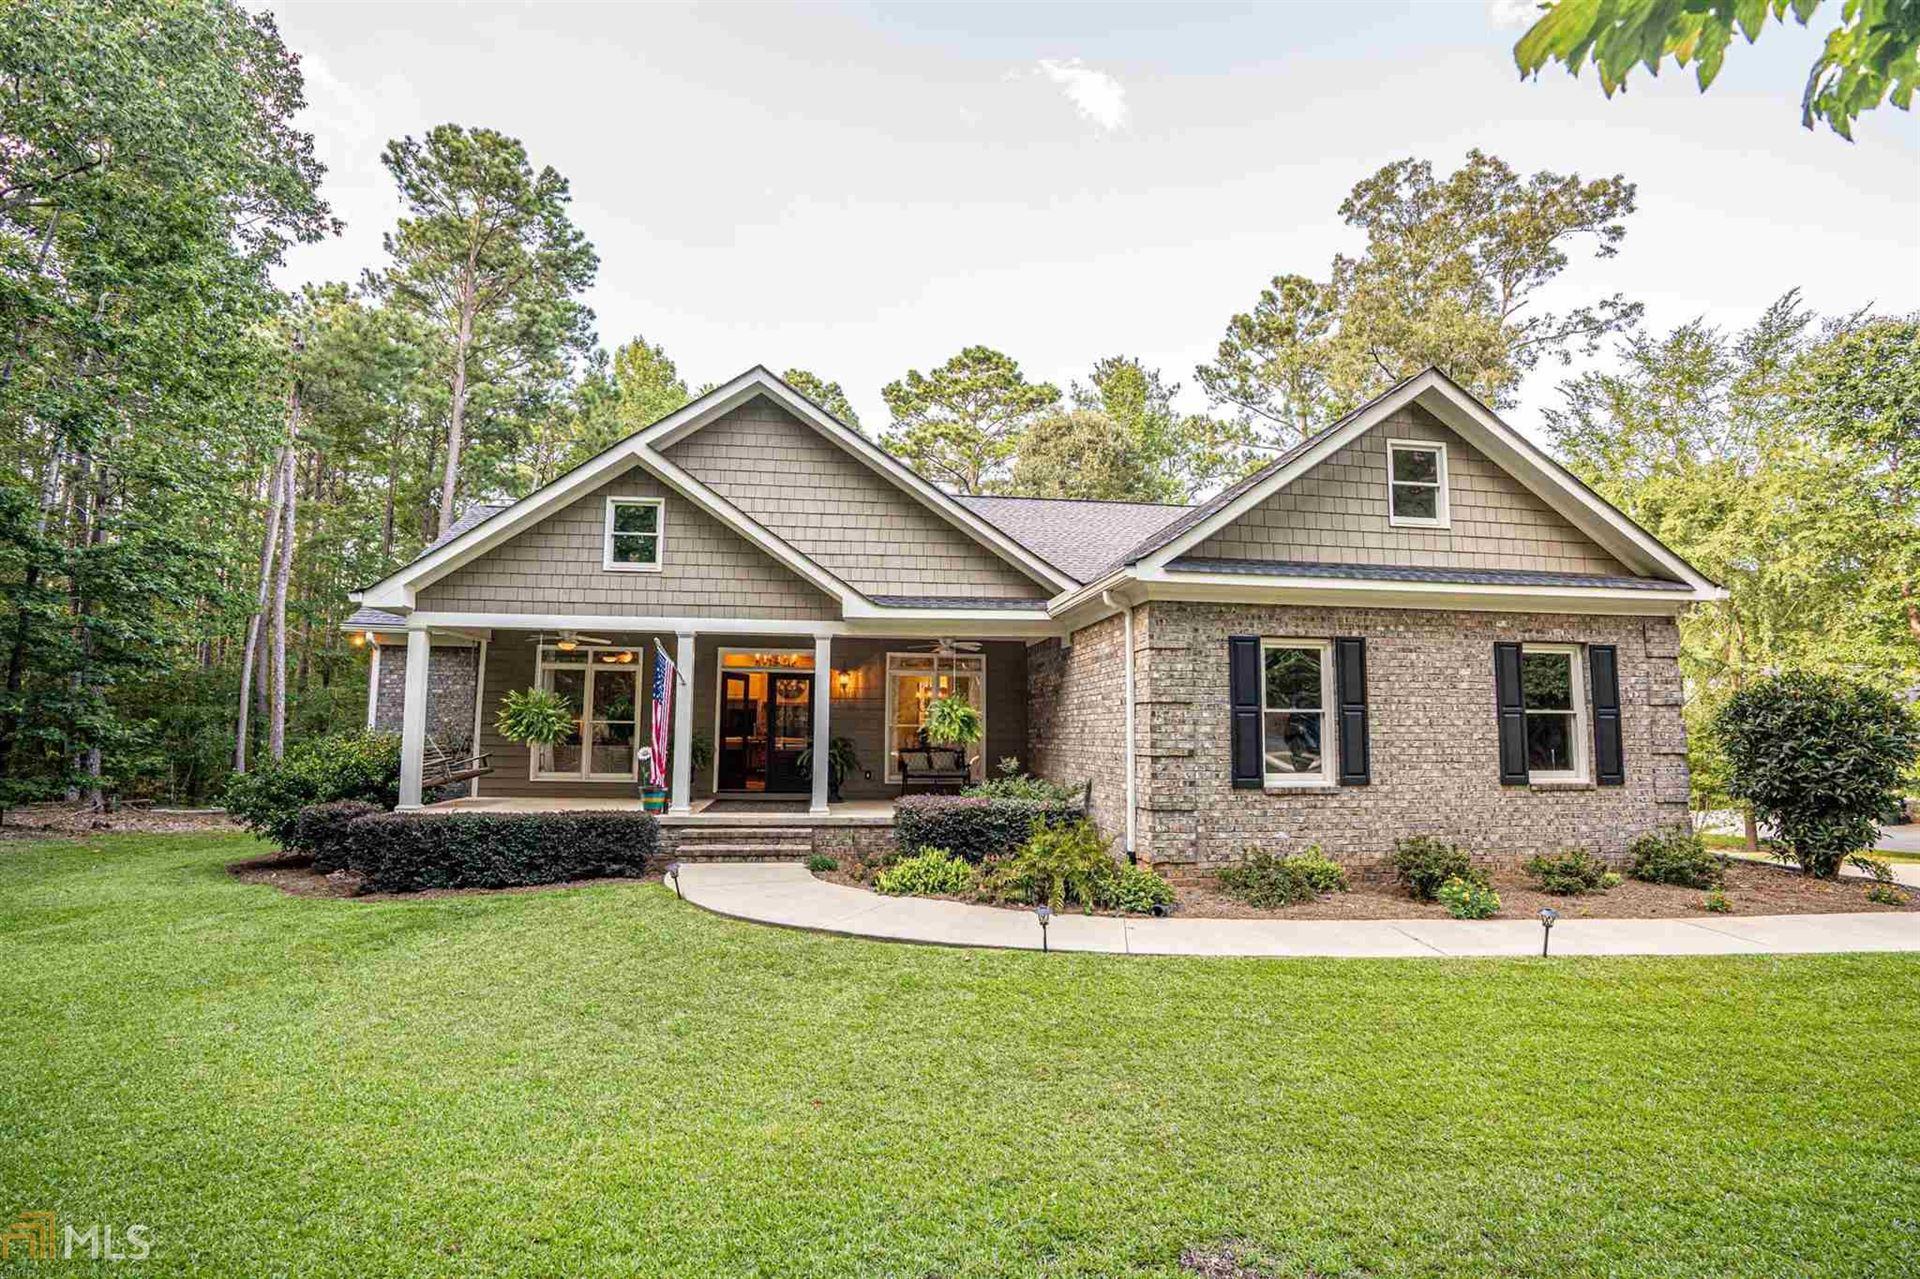 1020 Eagle Bluff Ct, Greensboro, GA 30642 - MLS#: 8830833